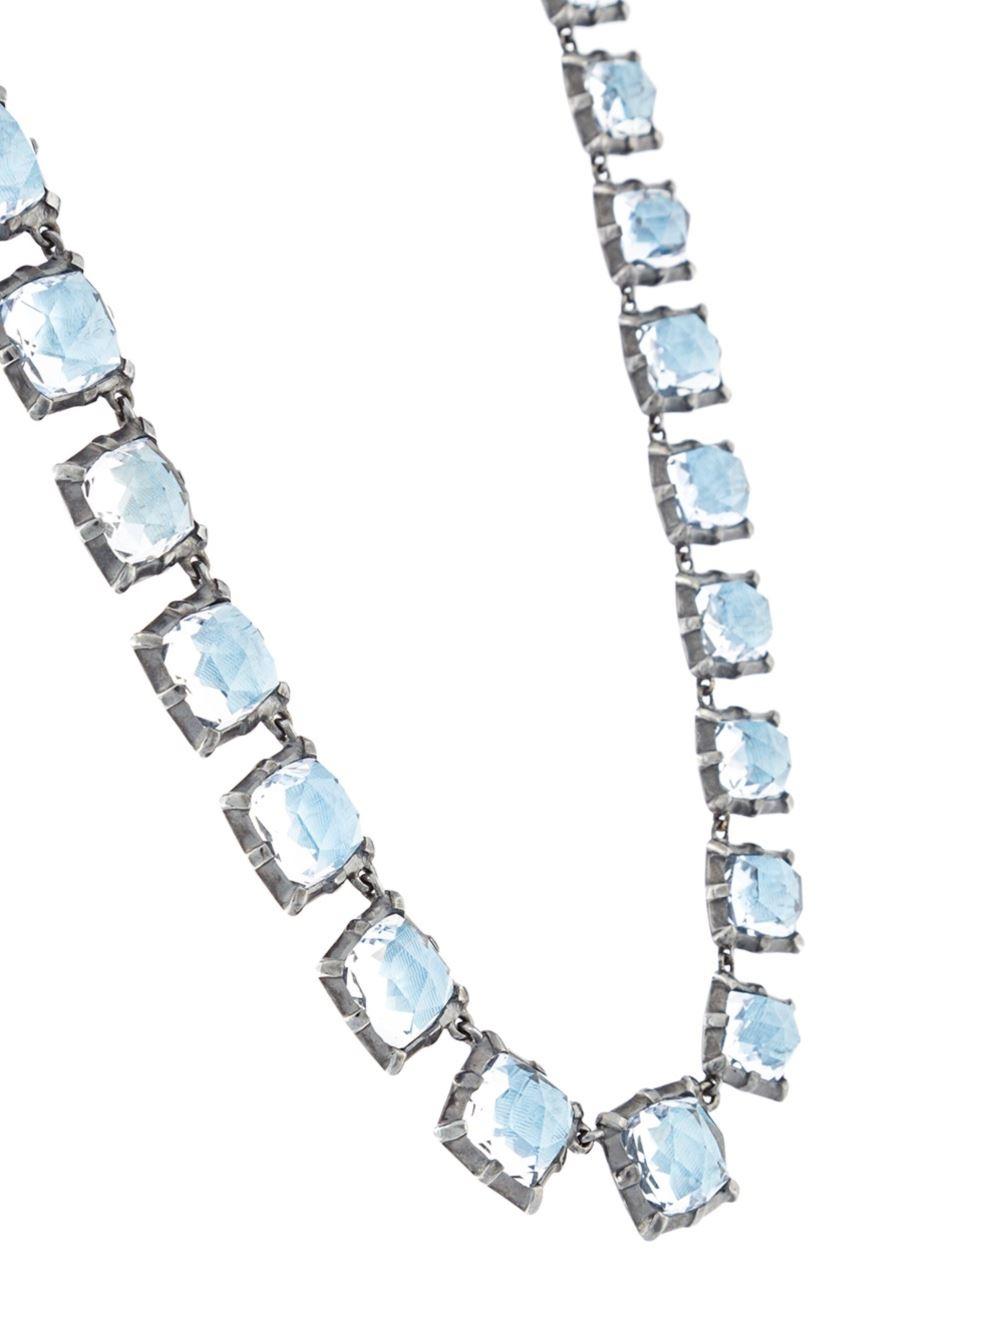 larkspur hawk graduated necklace blue lyst